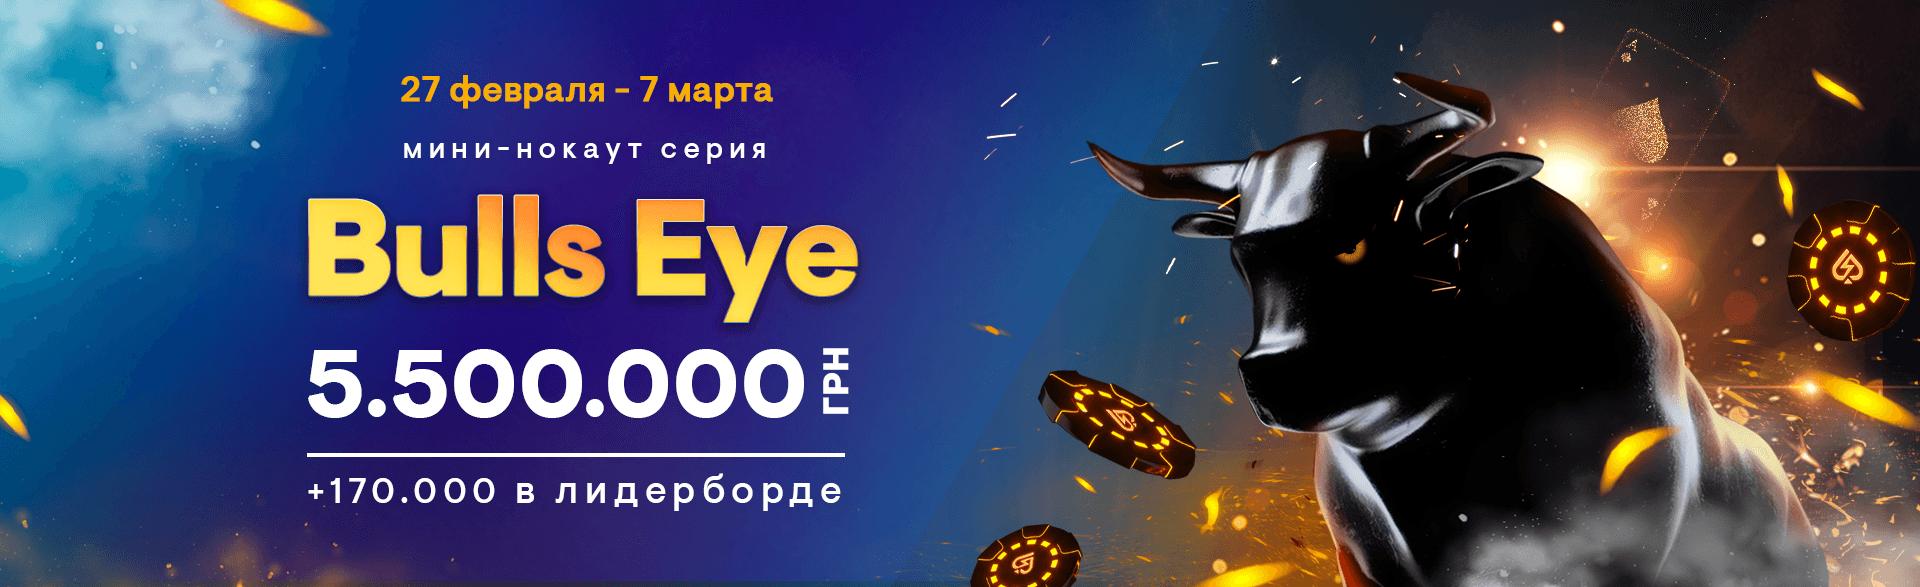 Bull's Eye KO Series